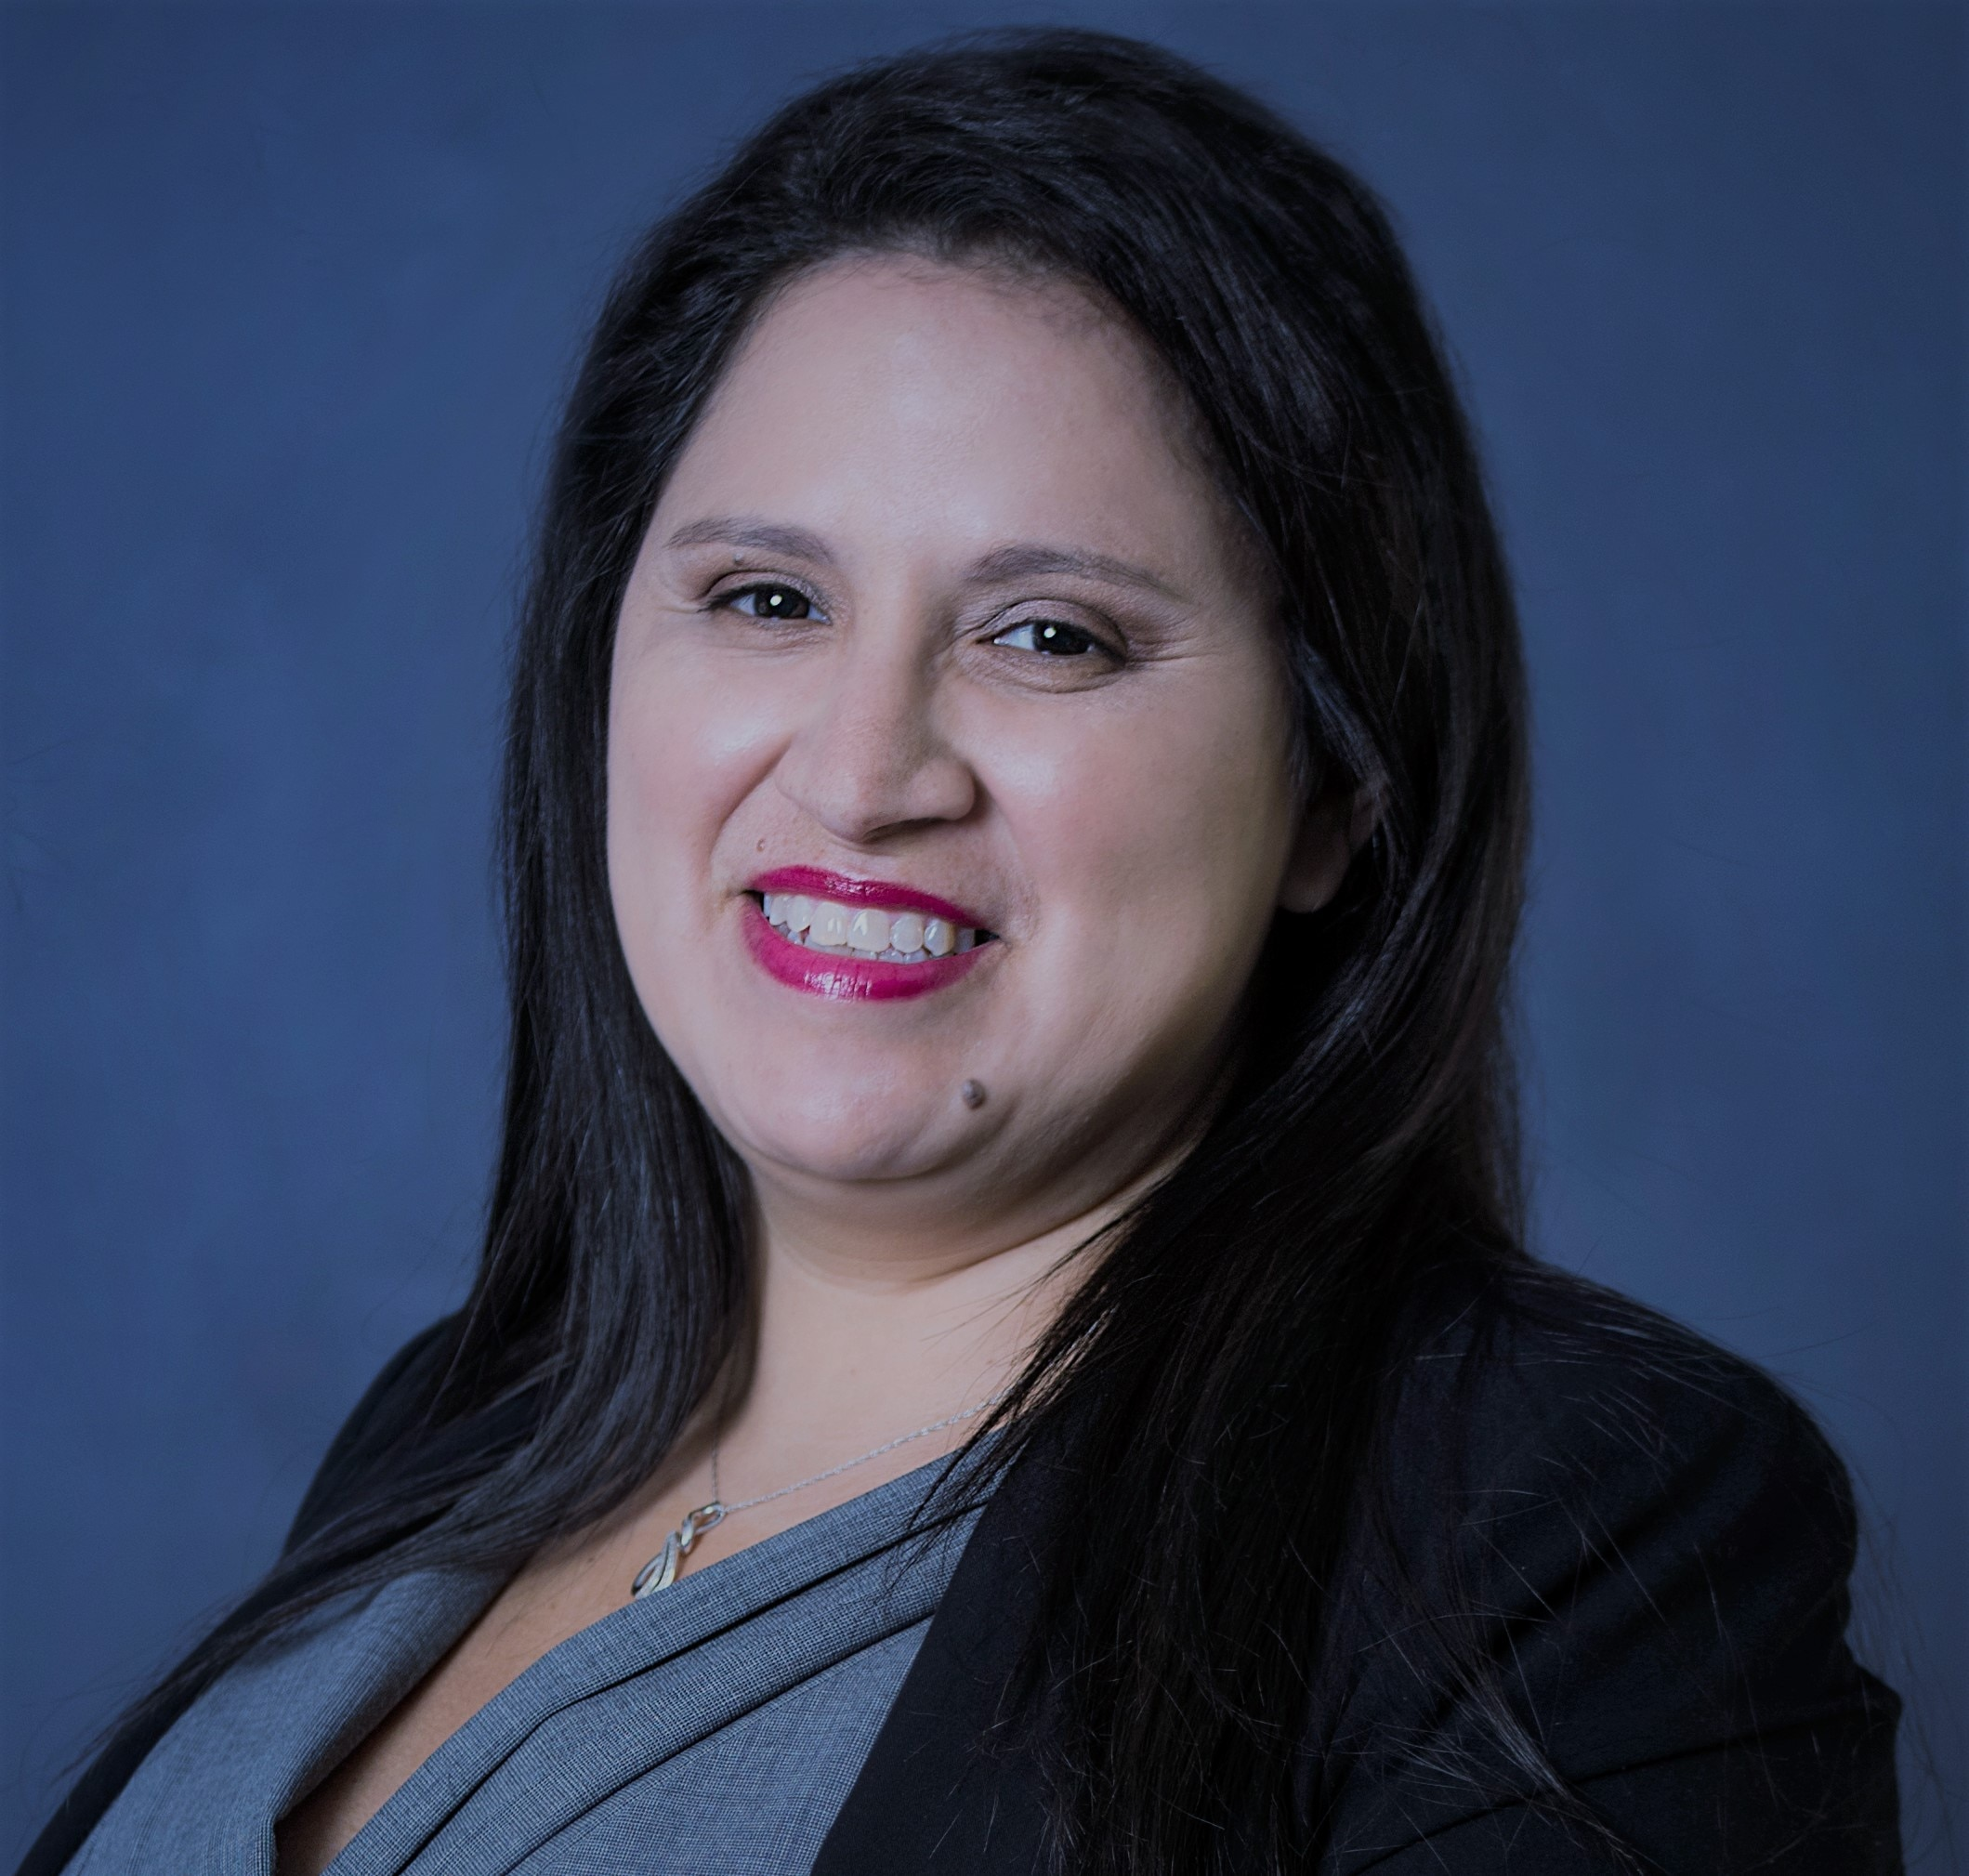 ERISELDA REYNA VUITTONET Financial Professional & Insurance Agent